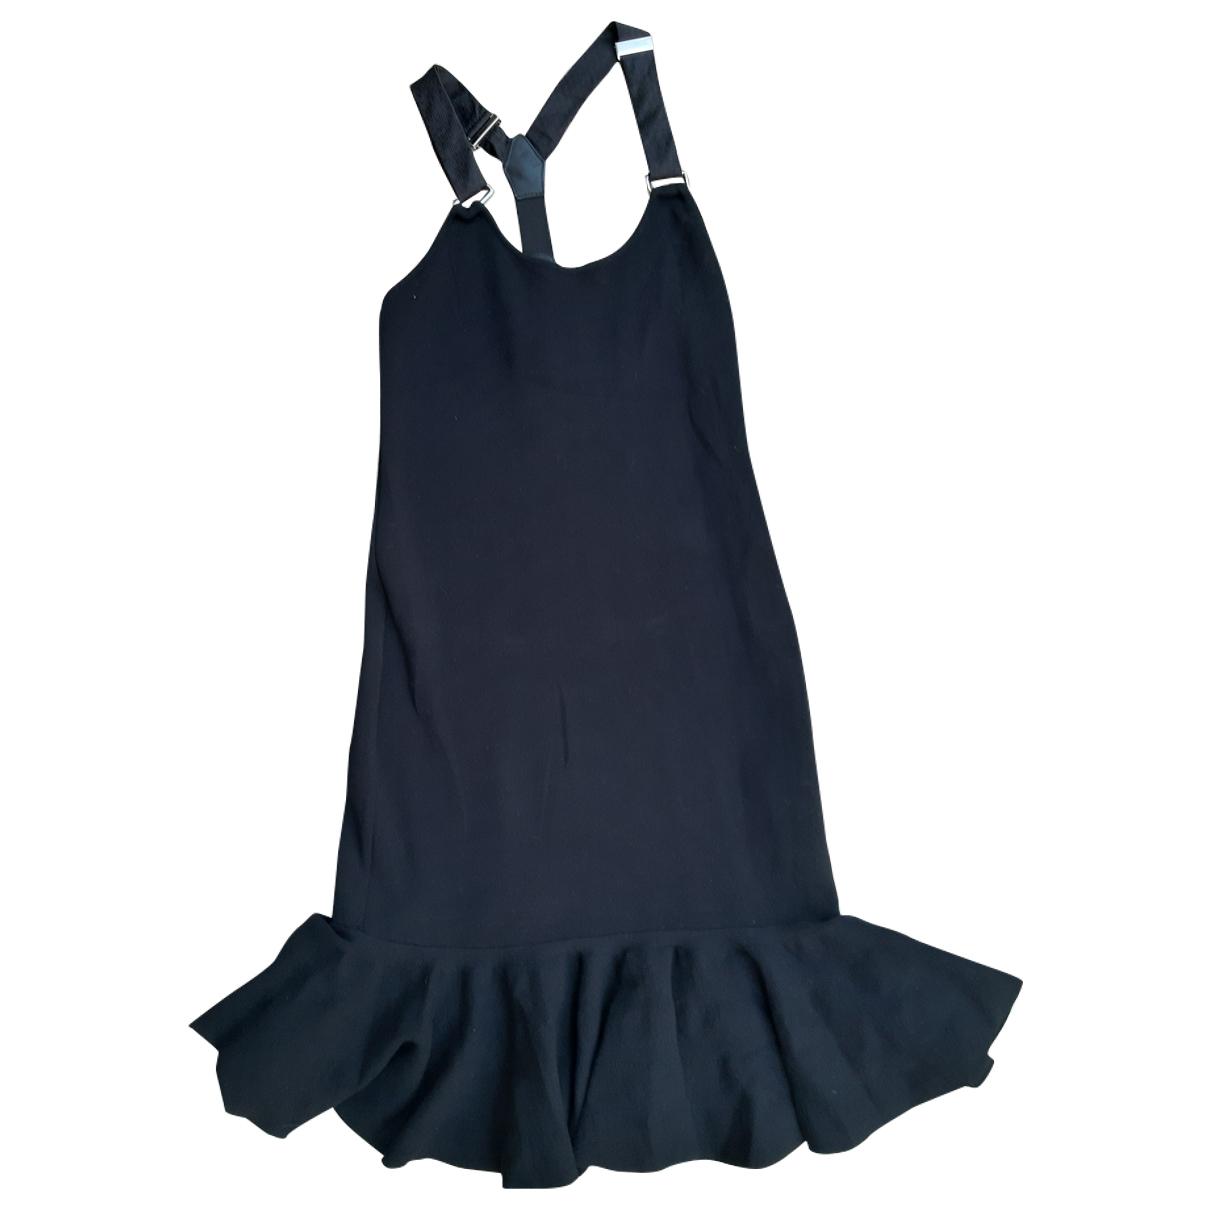 Polo Ralph Lauren - Robe   pour femme en coton - noir